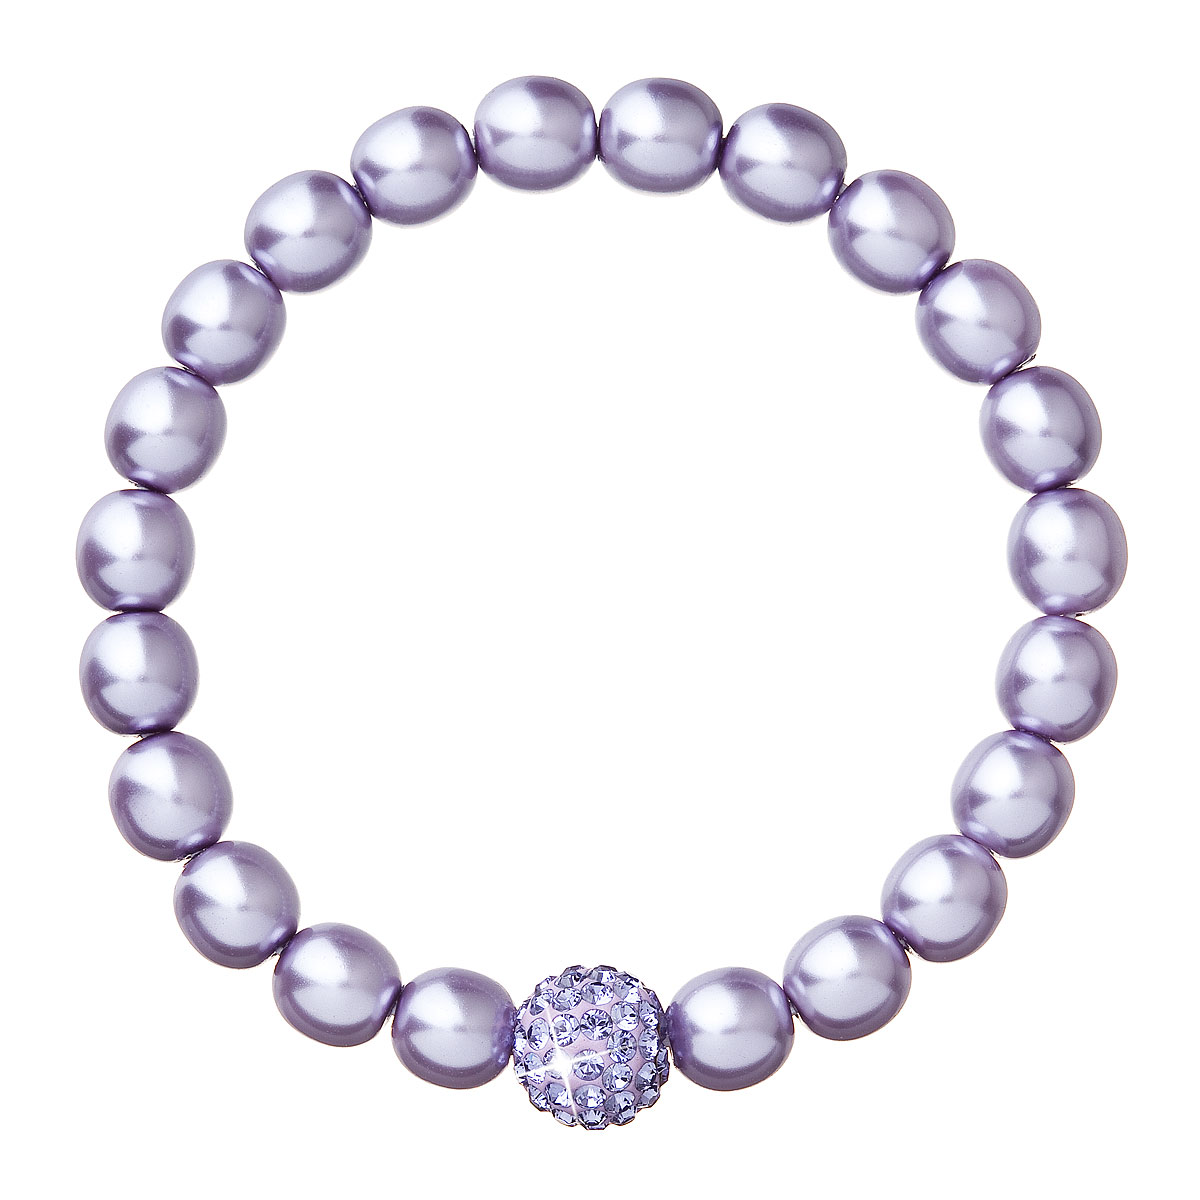 Náramek se Swarovski krystaly fialový 73003.3